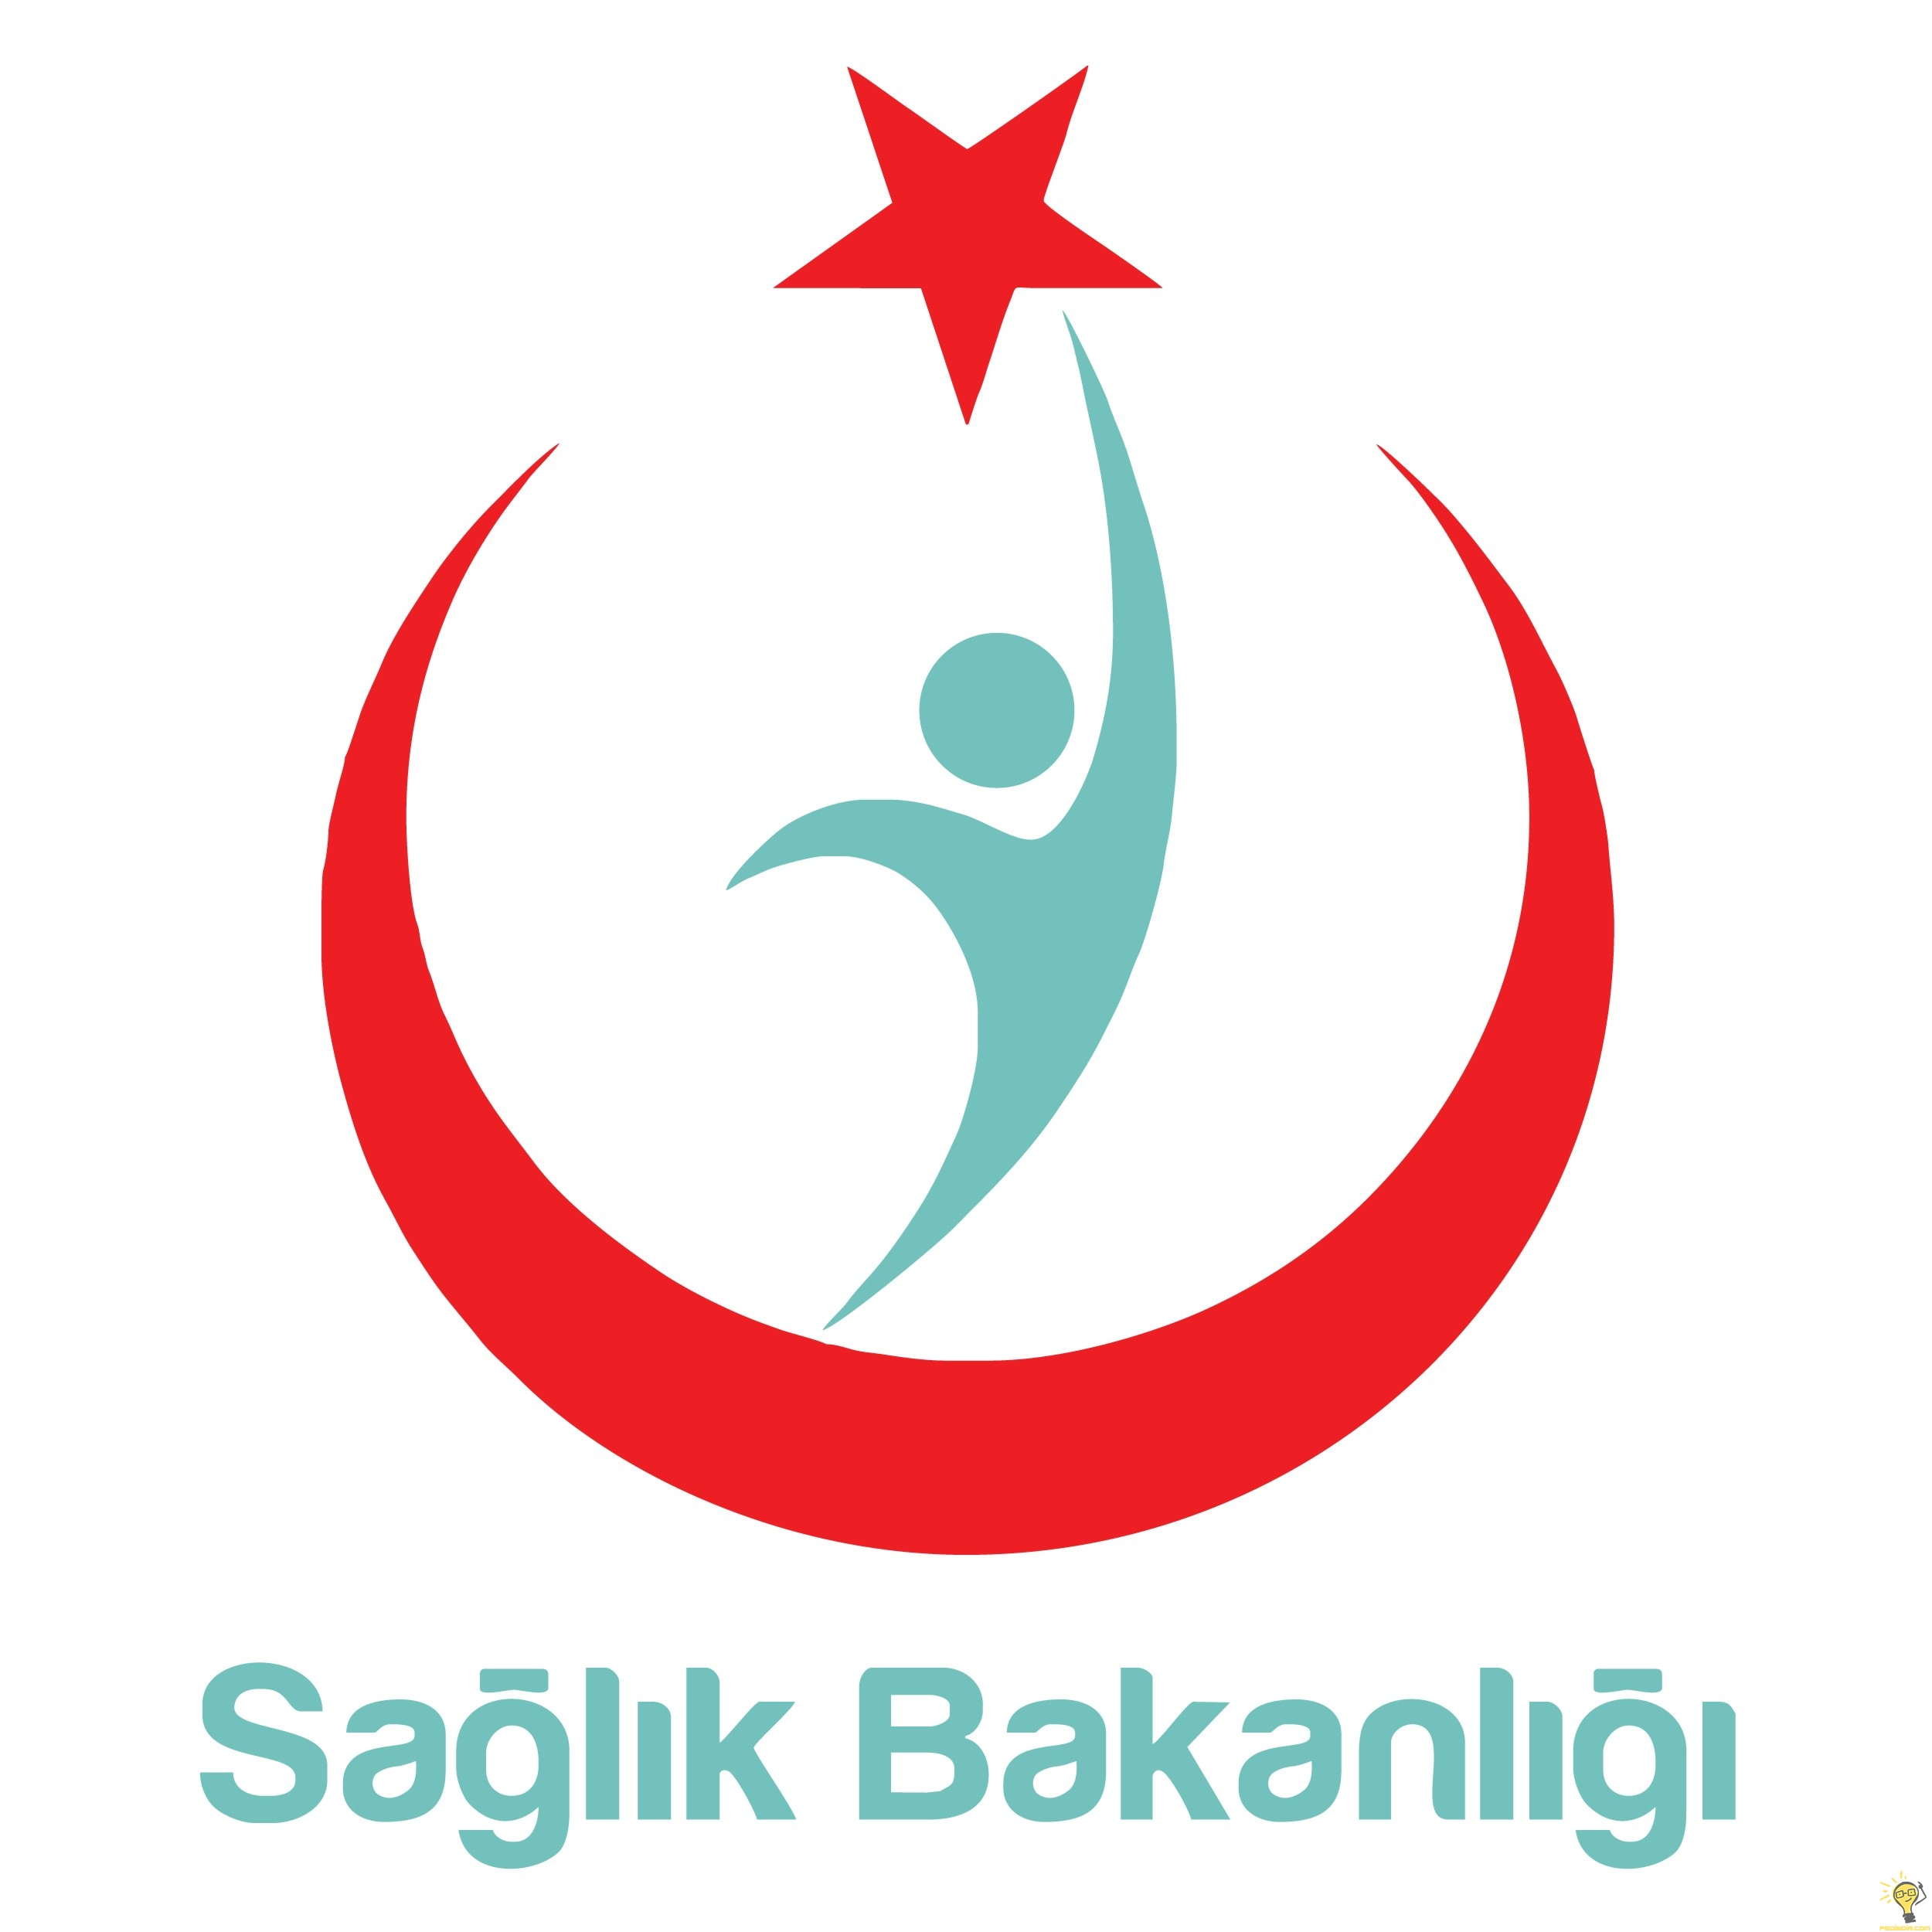 saglik_bakanligi_logo-vektorel